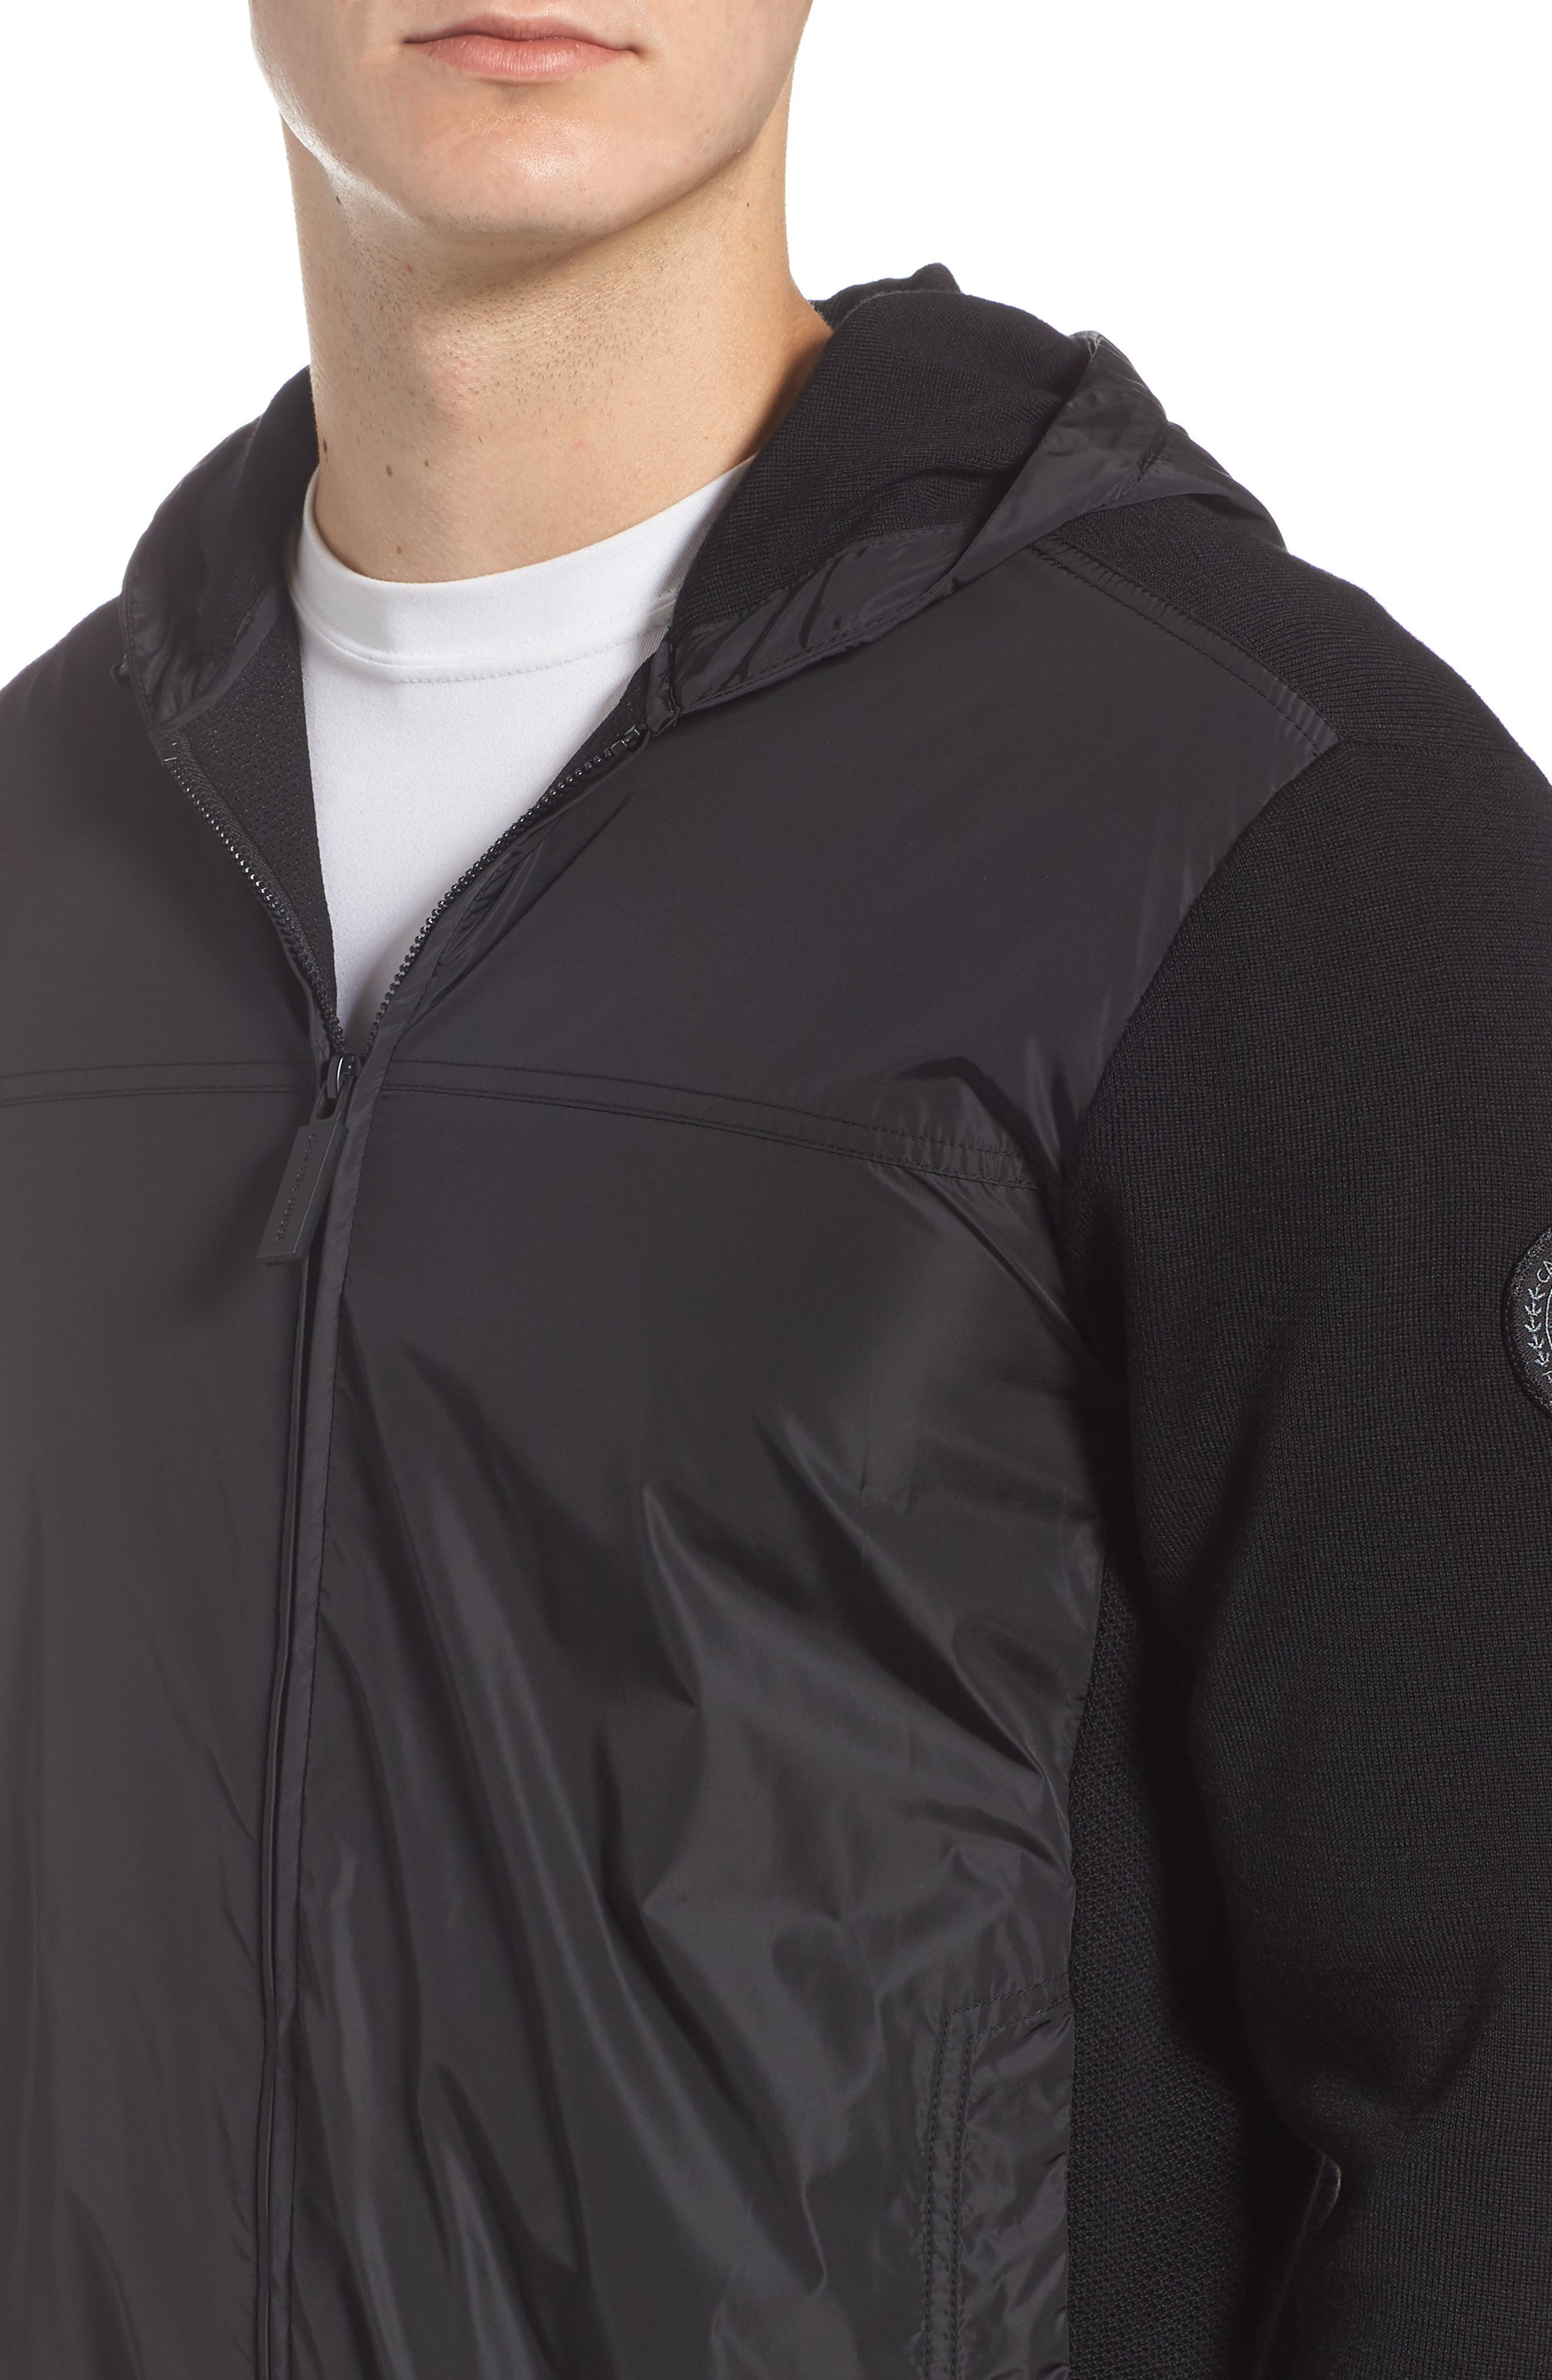 Windbridge Regular Fit Hooded Sweater Jacket,                             Alternate thumbnail 4, color,                             BLACK